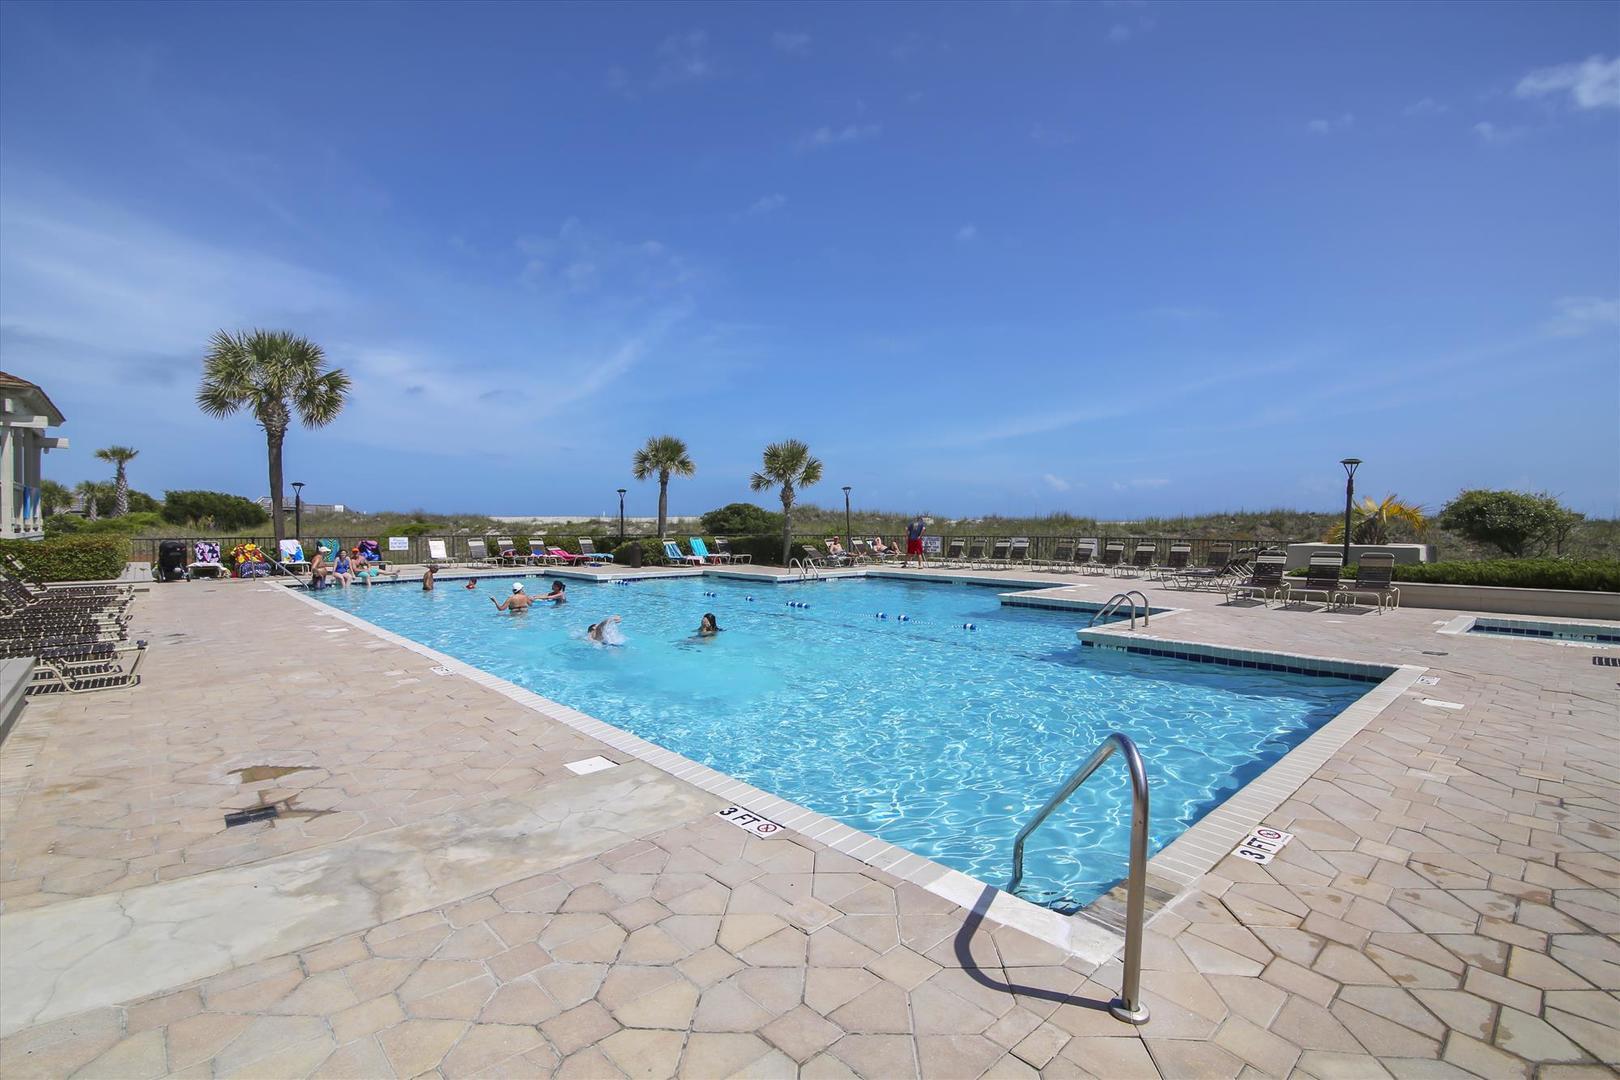 Ocean Creek NN9 - Beach Club Outdoor Pool